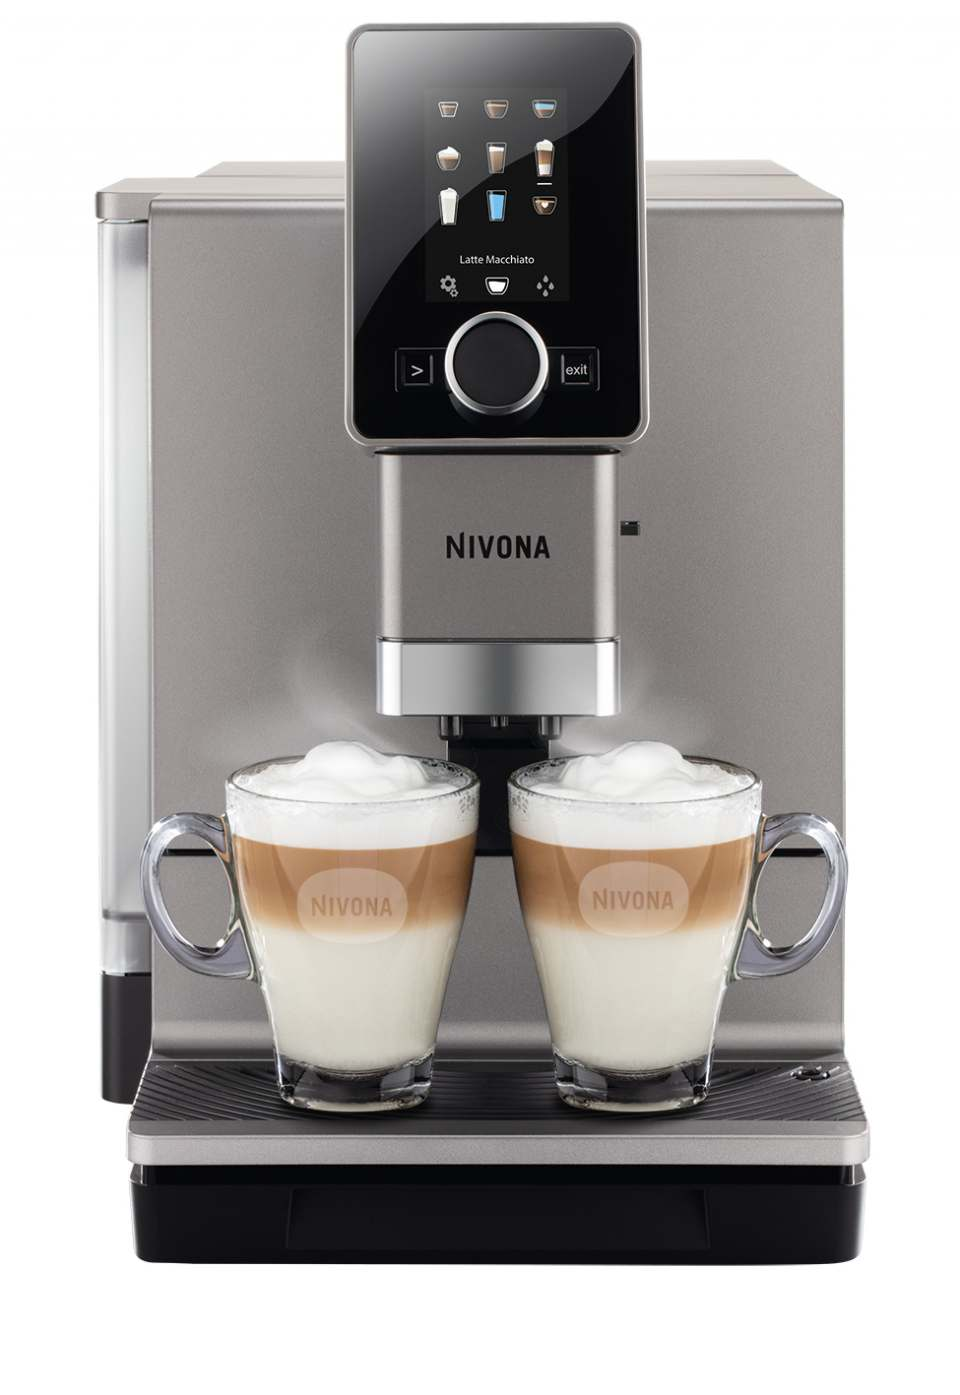 Nivona Kaffeevollautomat CafeRomatica NICR 930 mit Aroma Balance System.